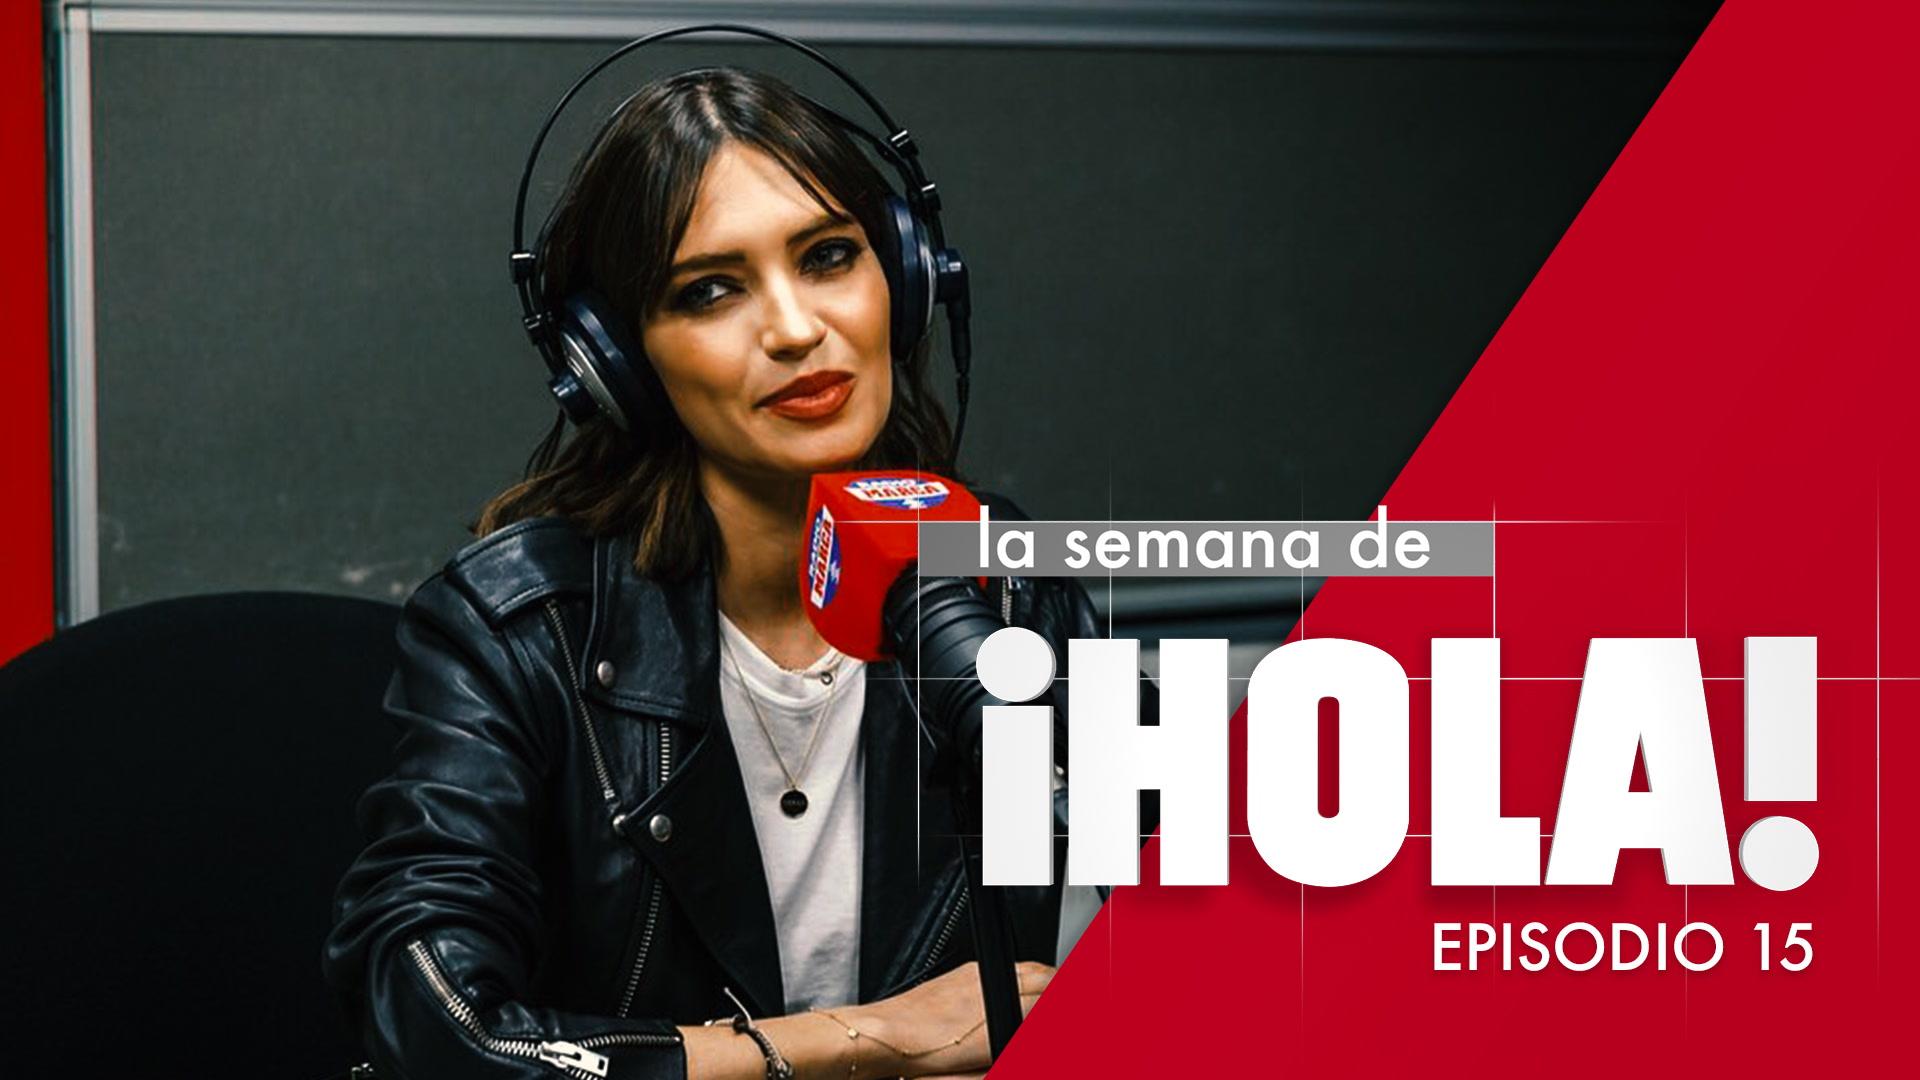 La semana de ¡HOLA! - Episodio 15